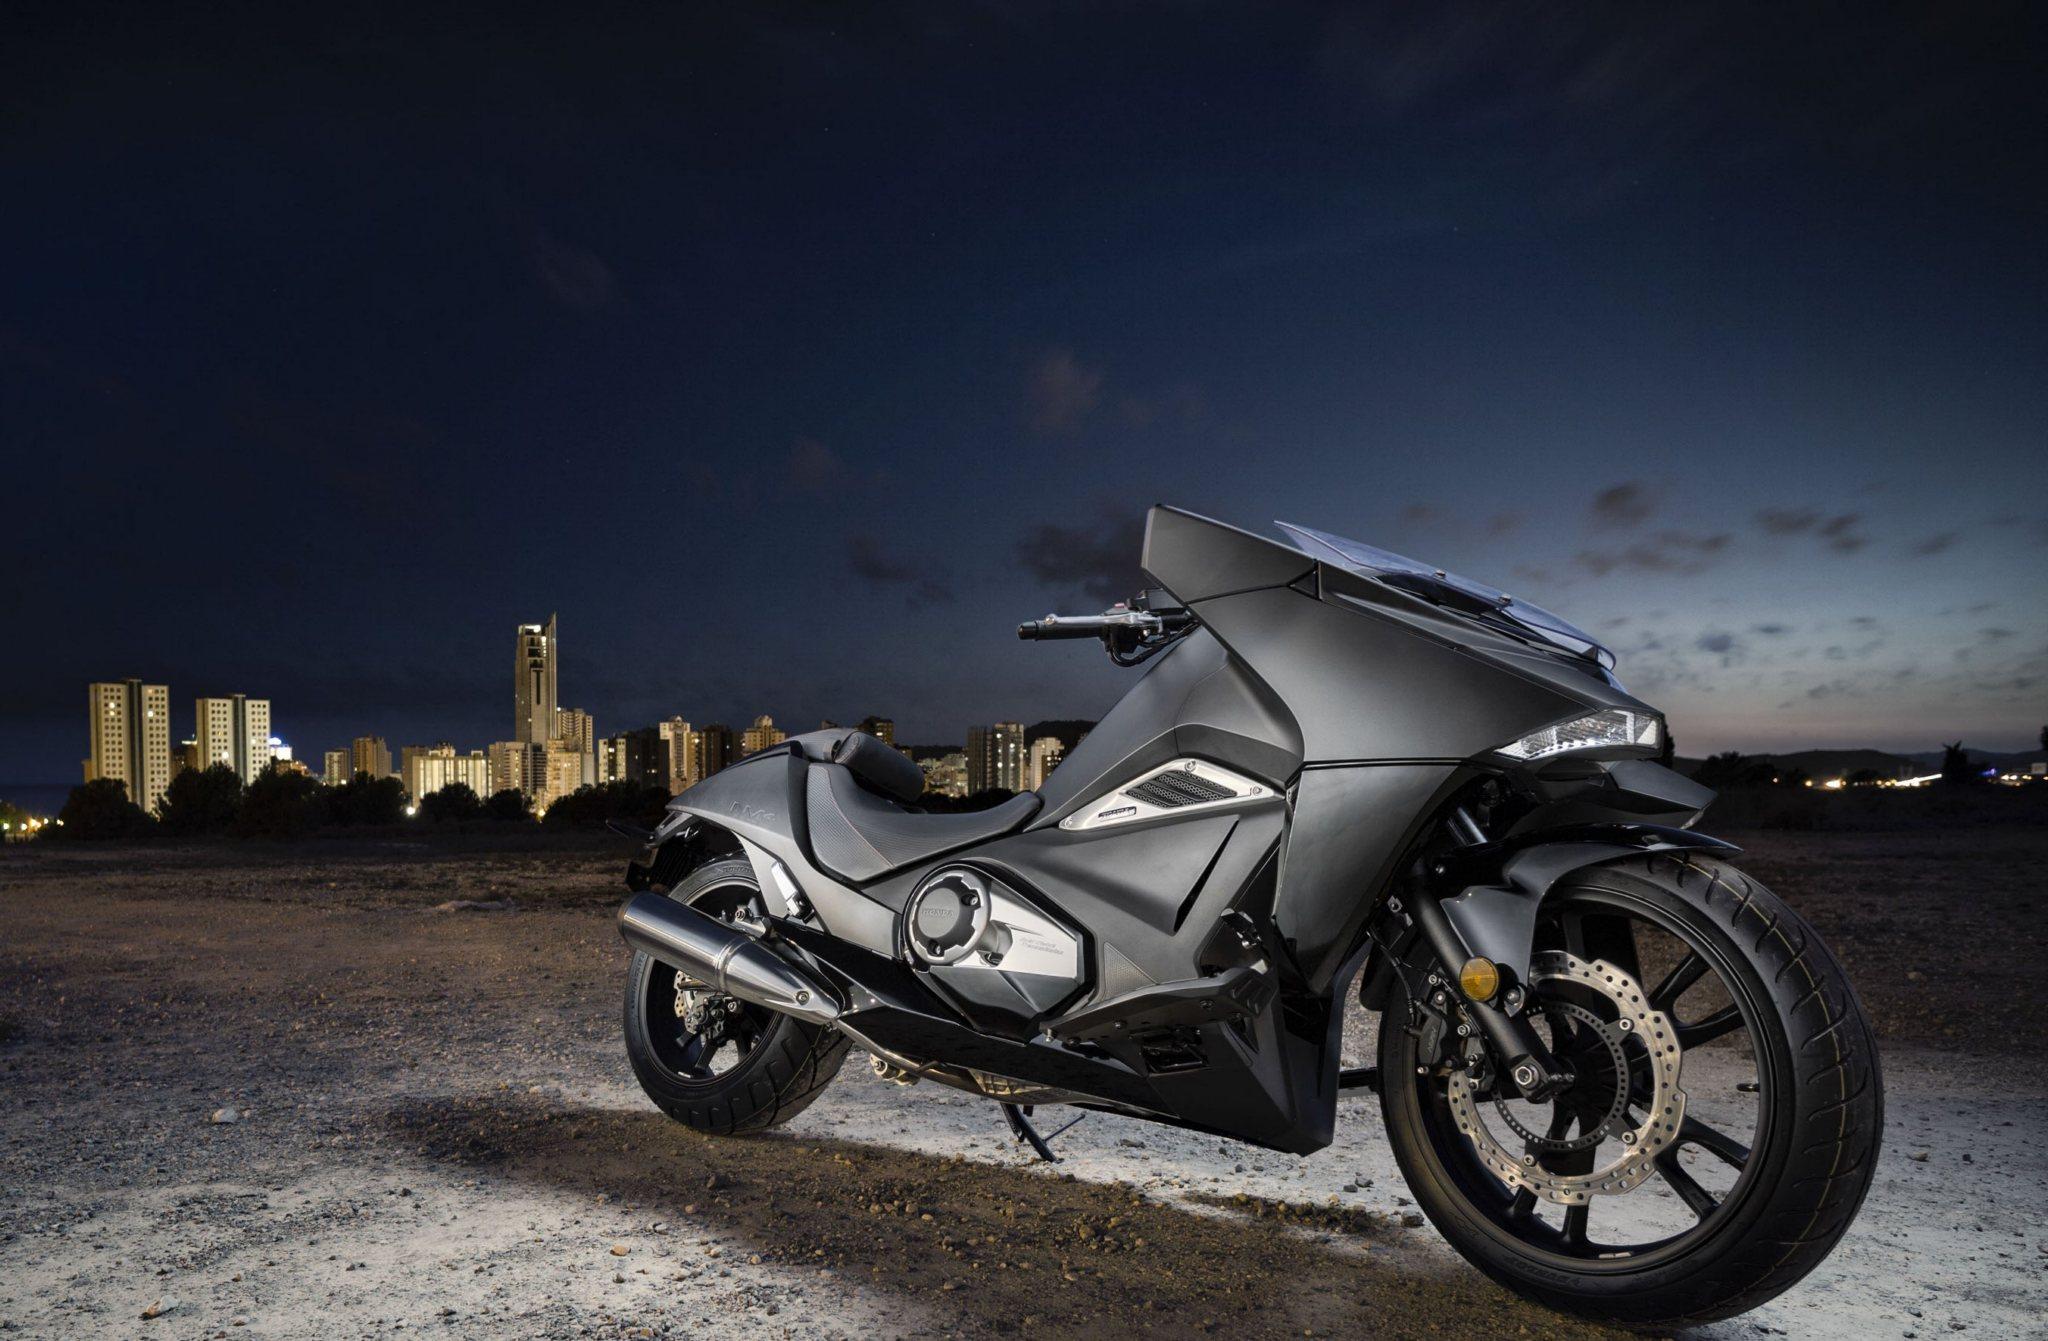 Honda NM4 Vultus Makes Debut Appearance at London Comic Con - autoevolution